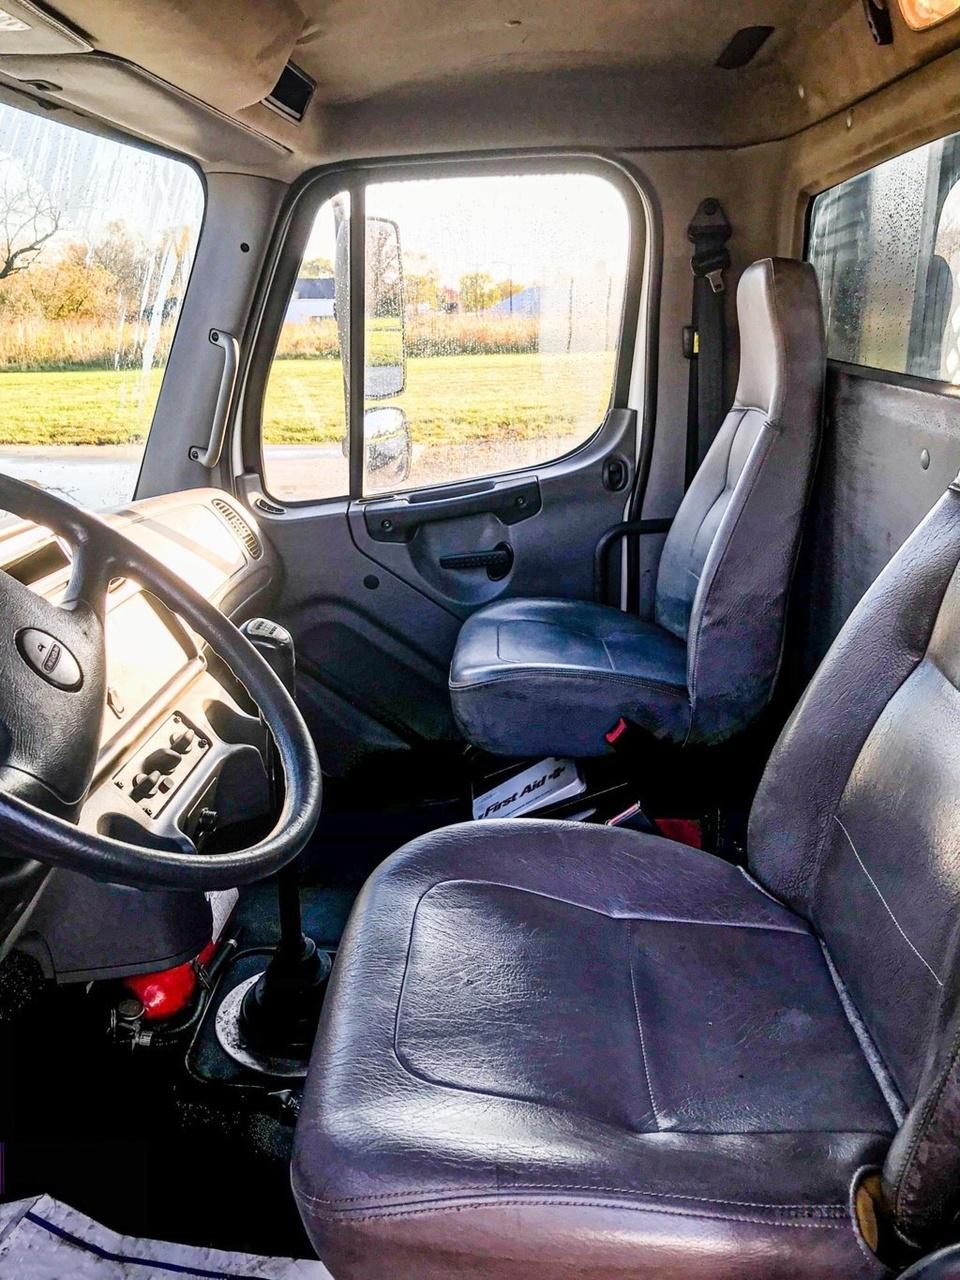 2012 Freightliner M2106 6x4 Flatbed Truck